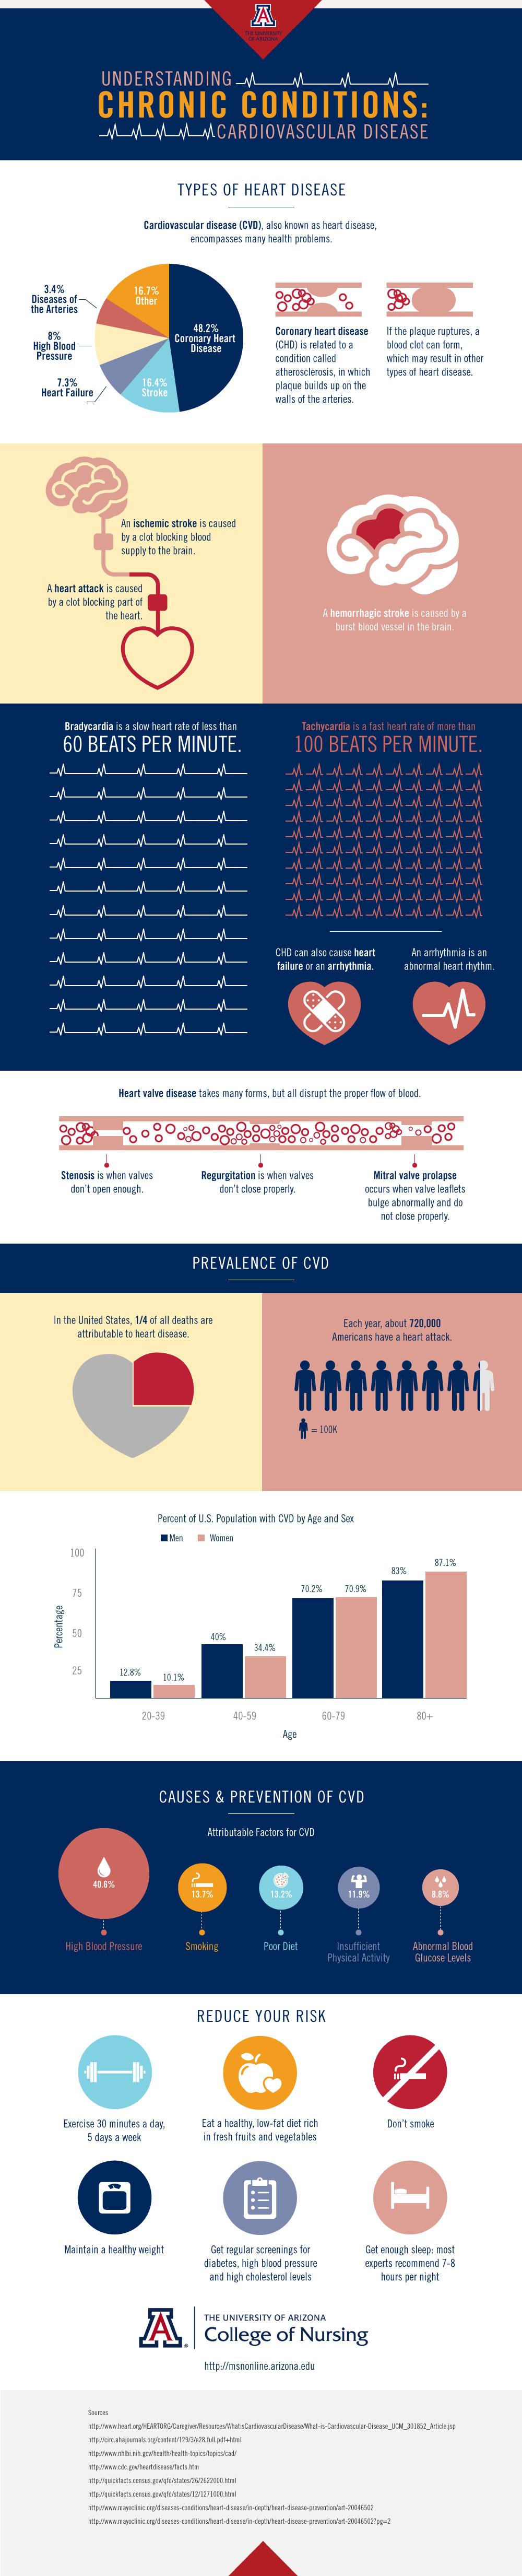 understanding-chronic-conditions-cardiovascular-disease